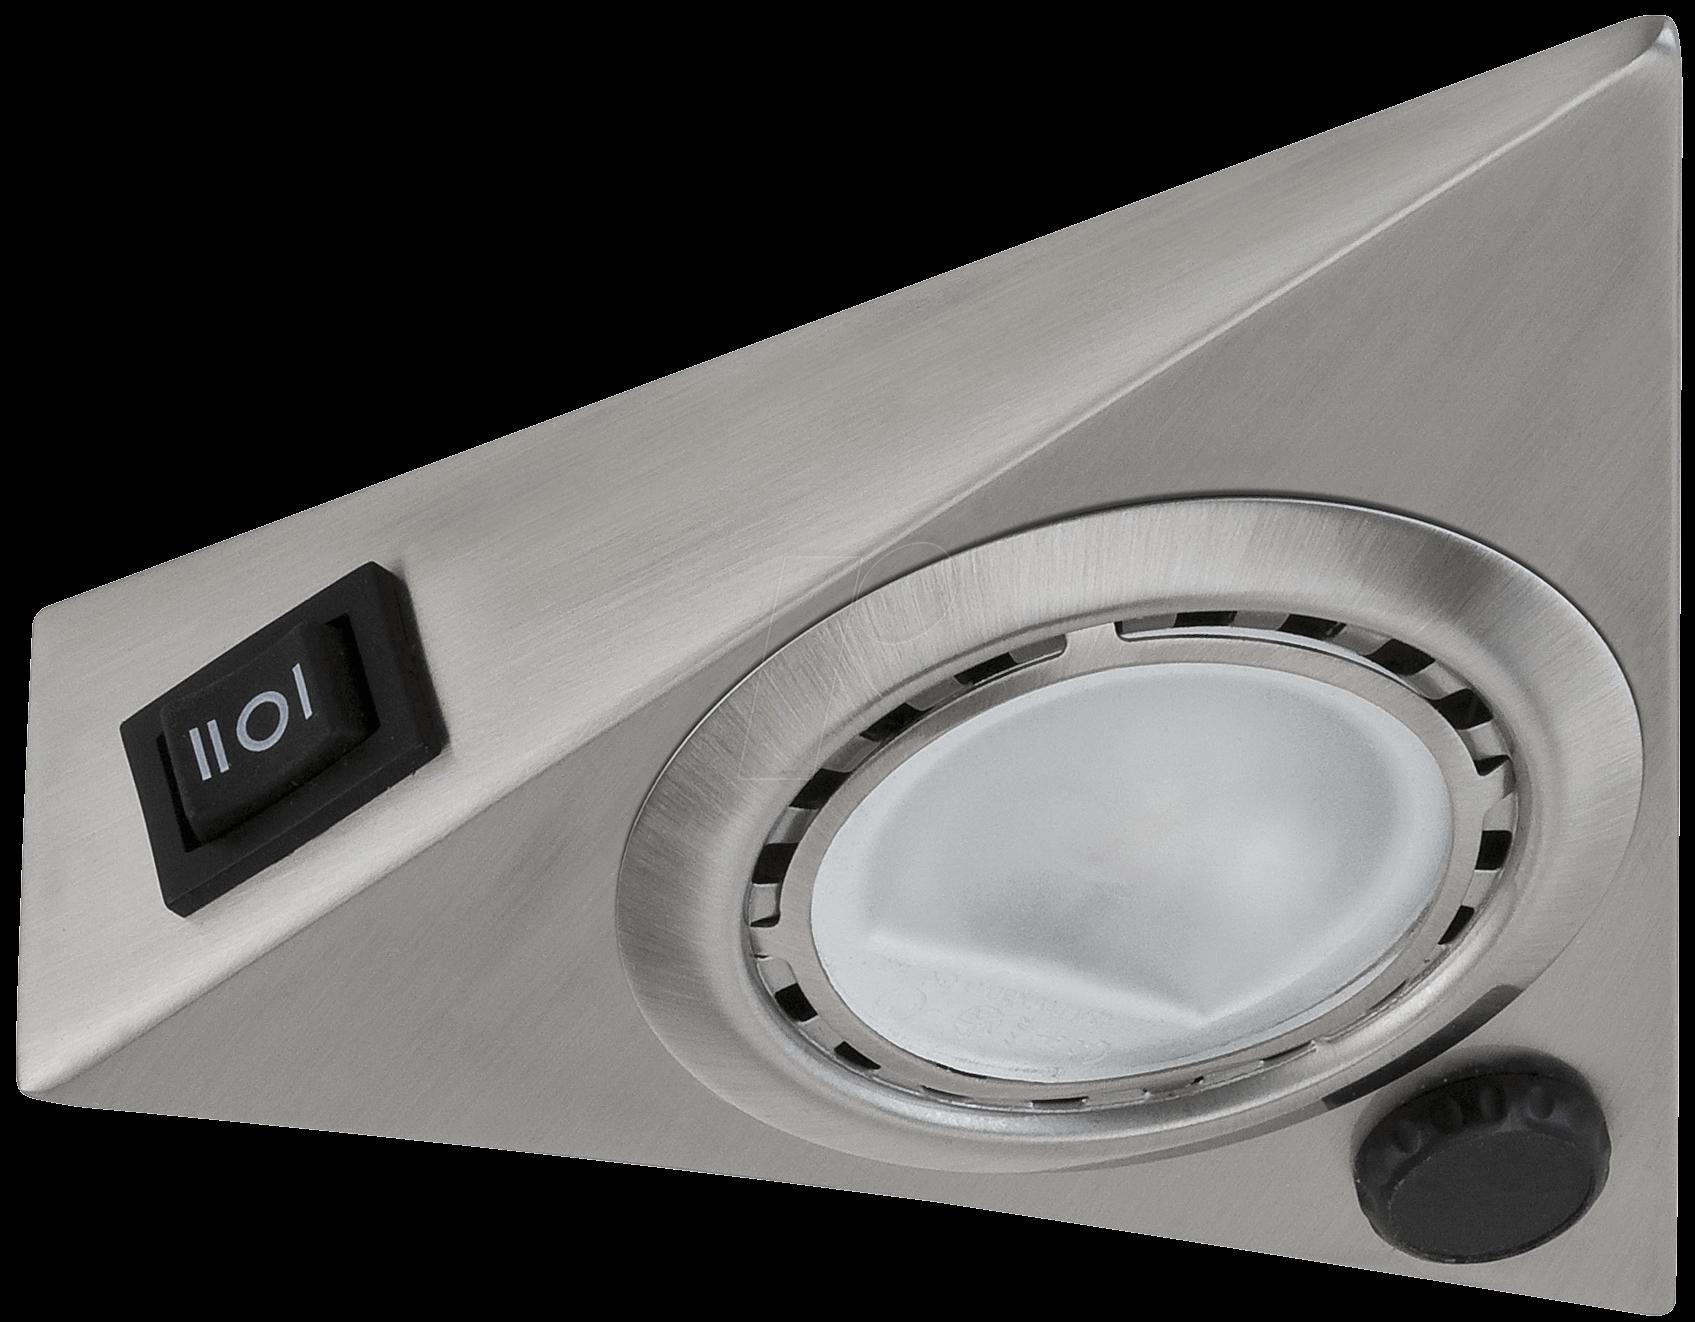 PLM 93500 - Möbelaufbauleuchte MicroLine, 20 W, 245 lm, eckig, silber